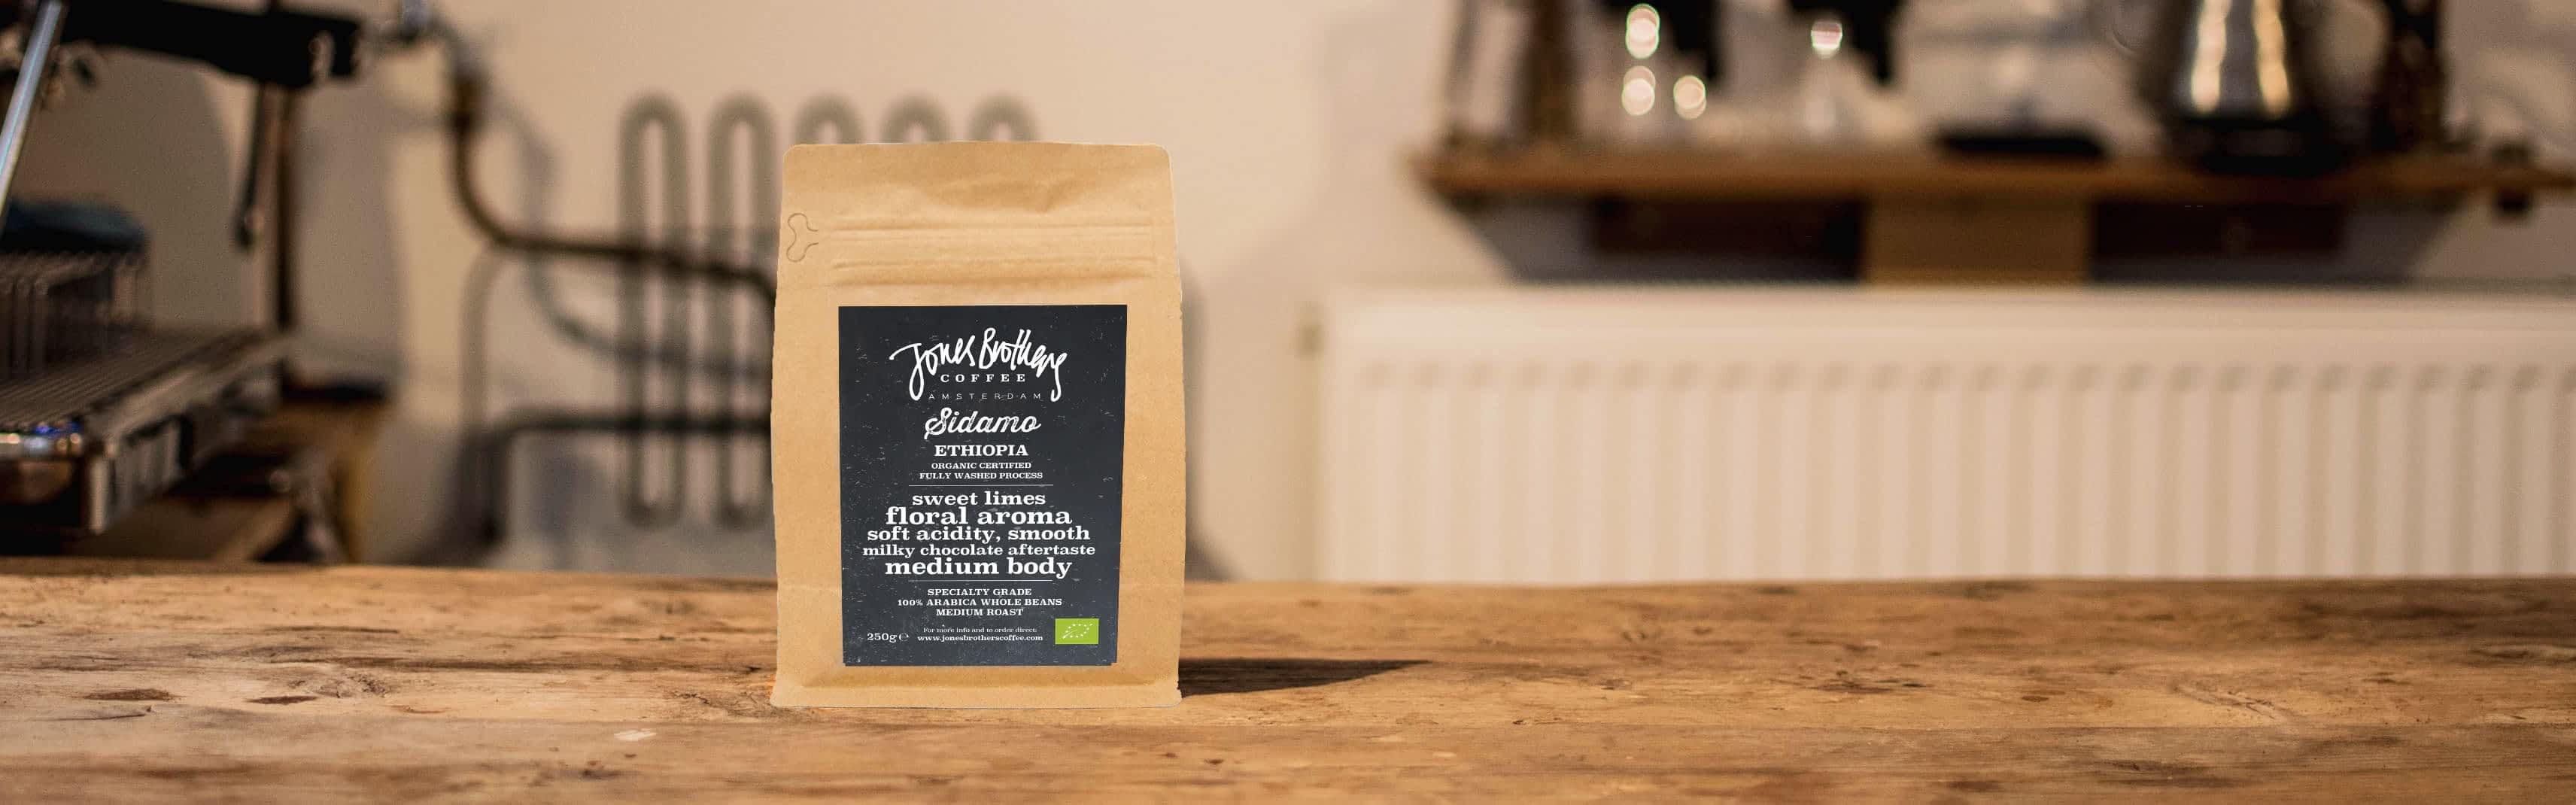 Ethiopia Sidamo specialty coffee